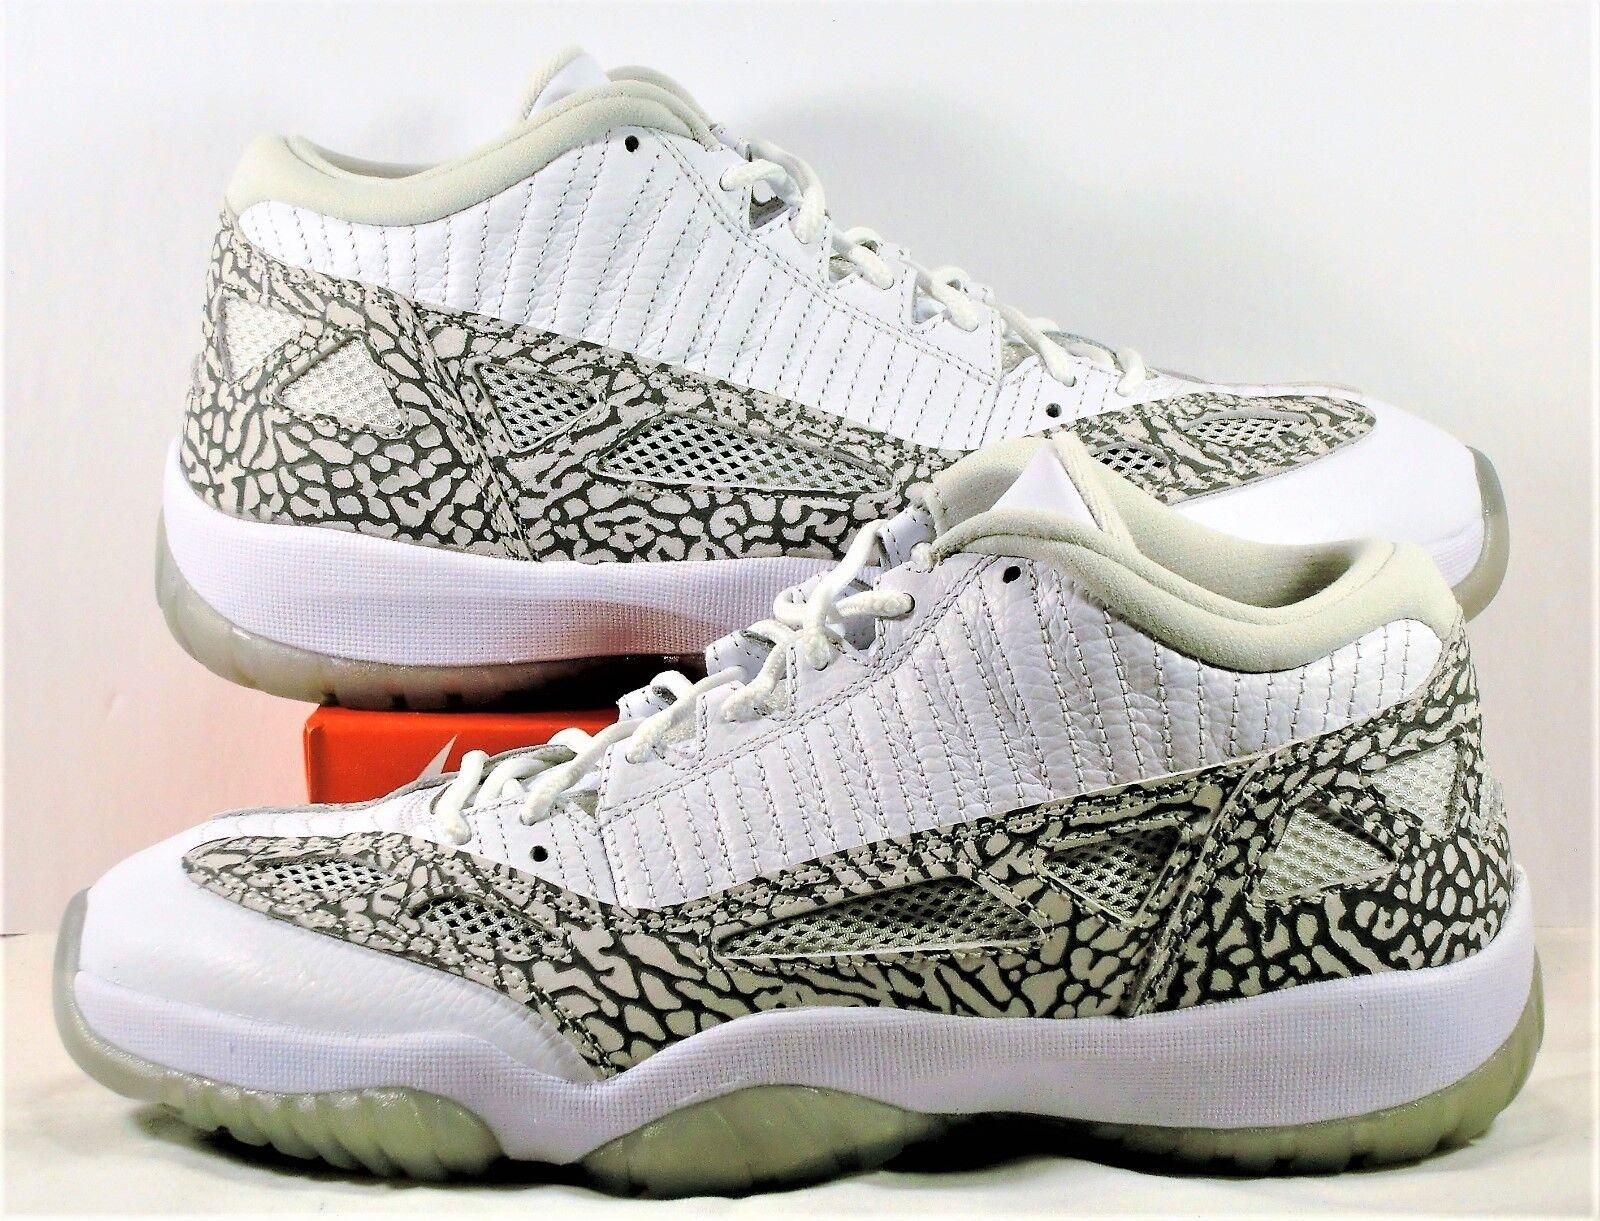 Nike Nike Nike Air Jordan Retro 11 XI Low Blanco sz gris cobalto & Zen 9,5 nueva 306008 102 barato y hermoso moda b19eb5